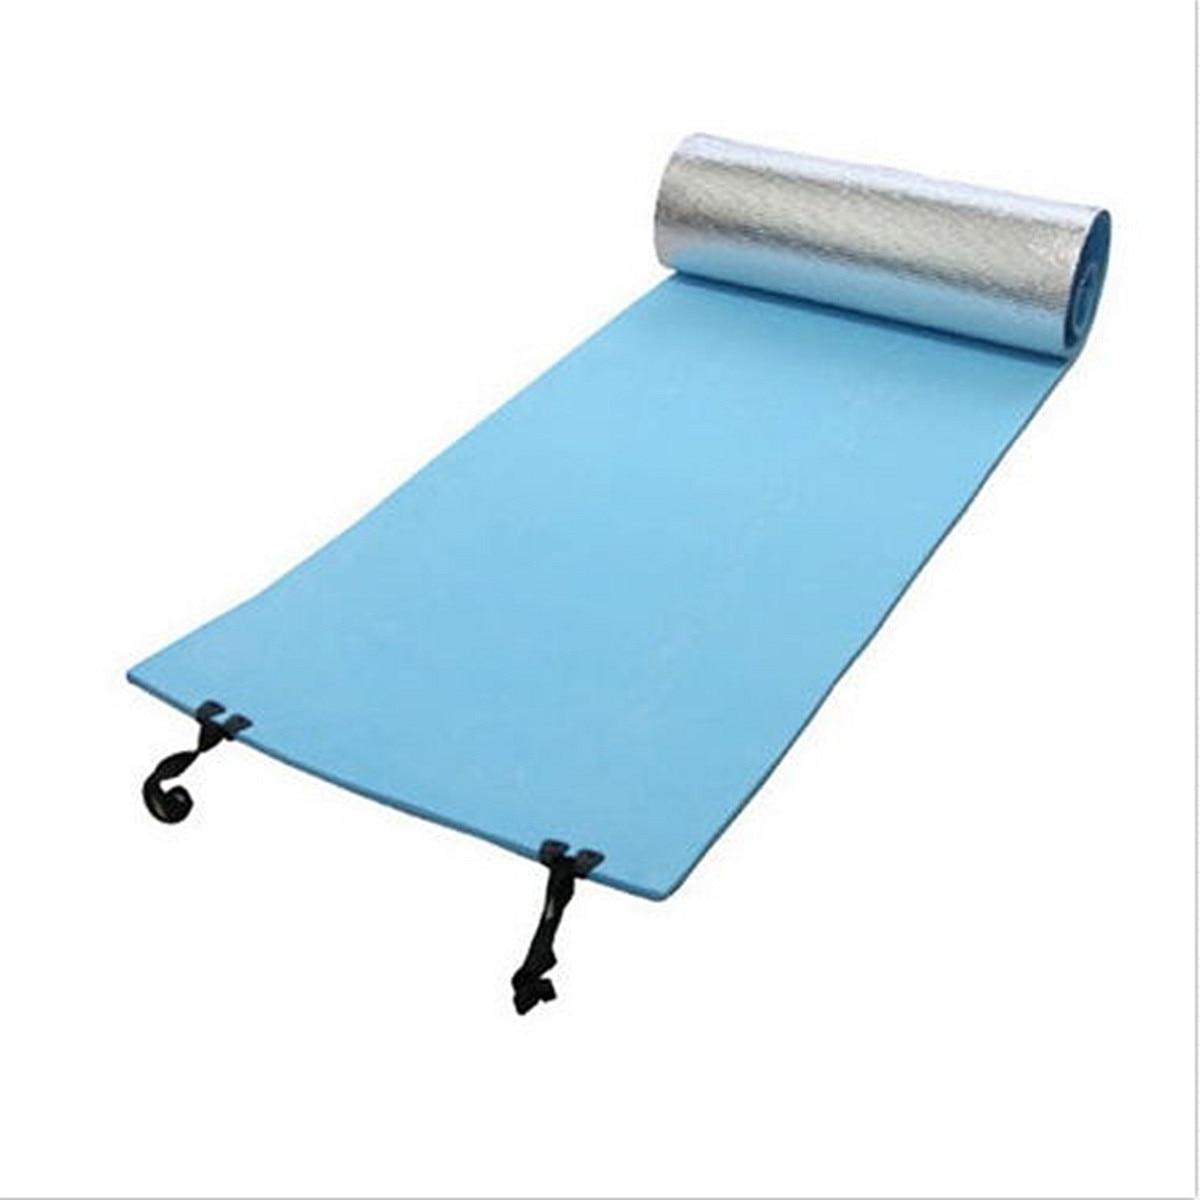 Eva Foam Singleside Outdoor Beach Camping Sleeping Mat Hiking Travel Picnic Pad Cushion Dampproof Gym Fitness